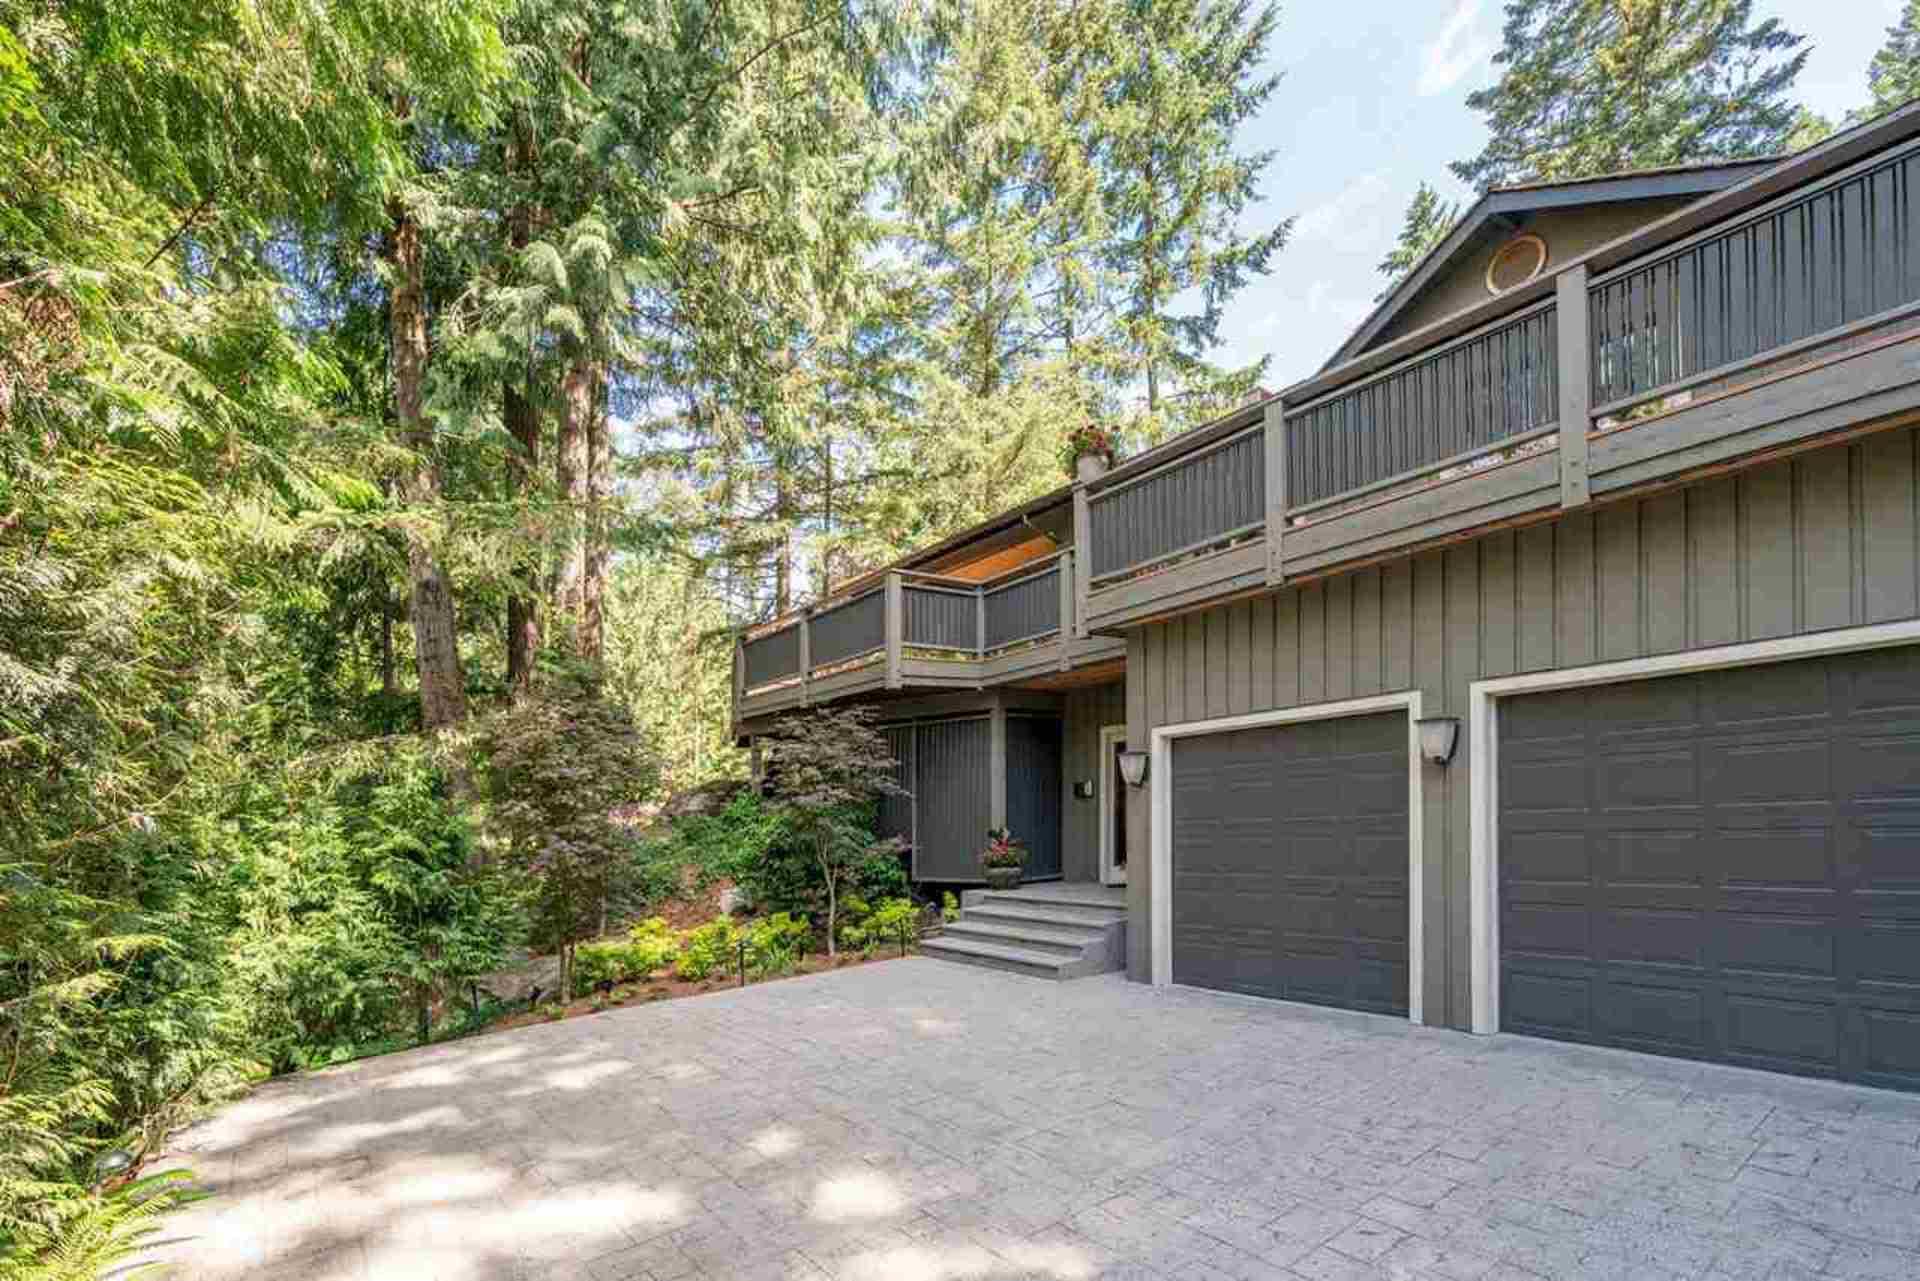 4620-woodburn-road-cypress-park-estates-west-vancouver-20 at 4620 Woodburn Road, Cypress Park Estates, West Vancouver